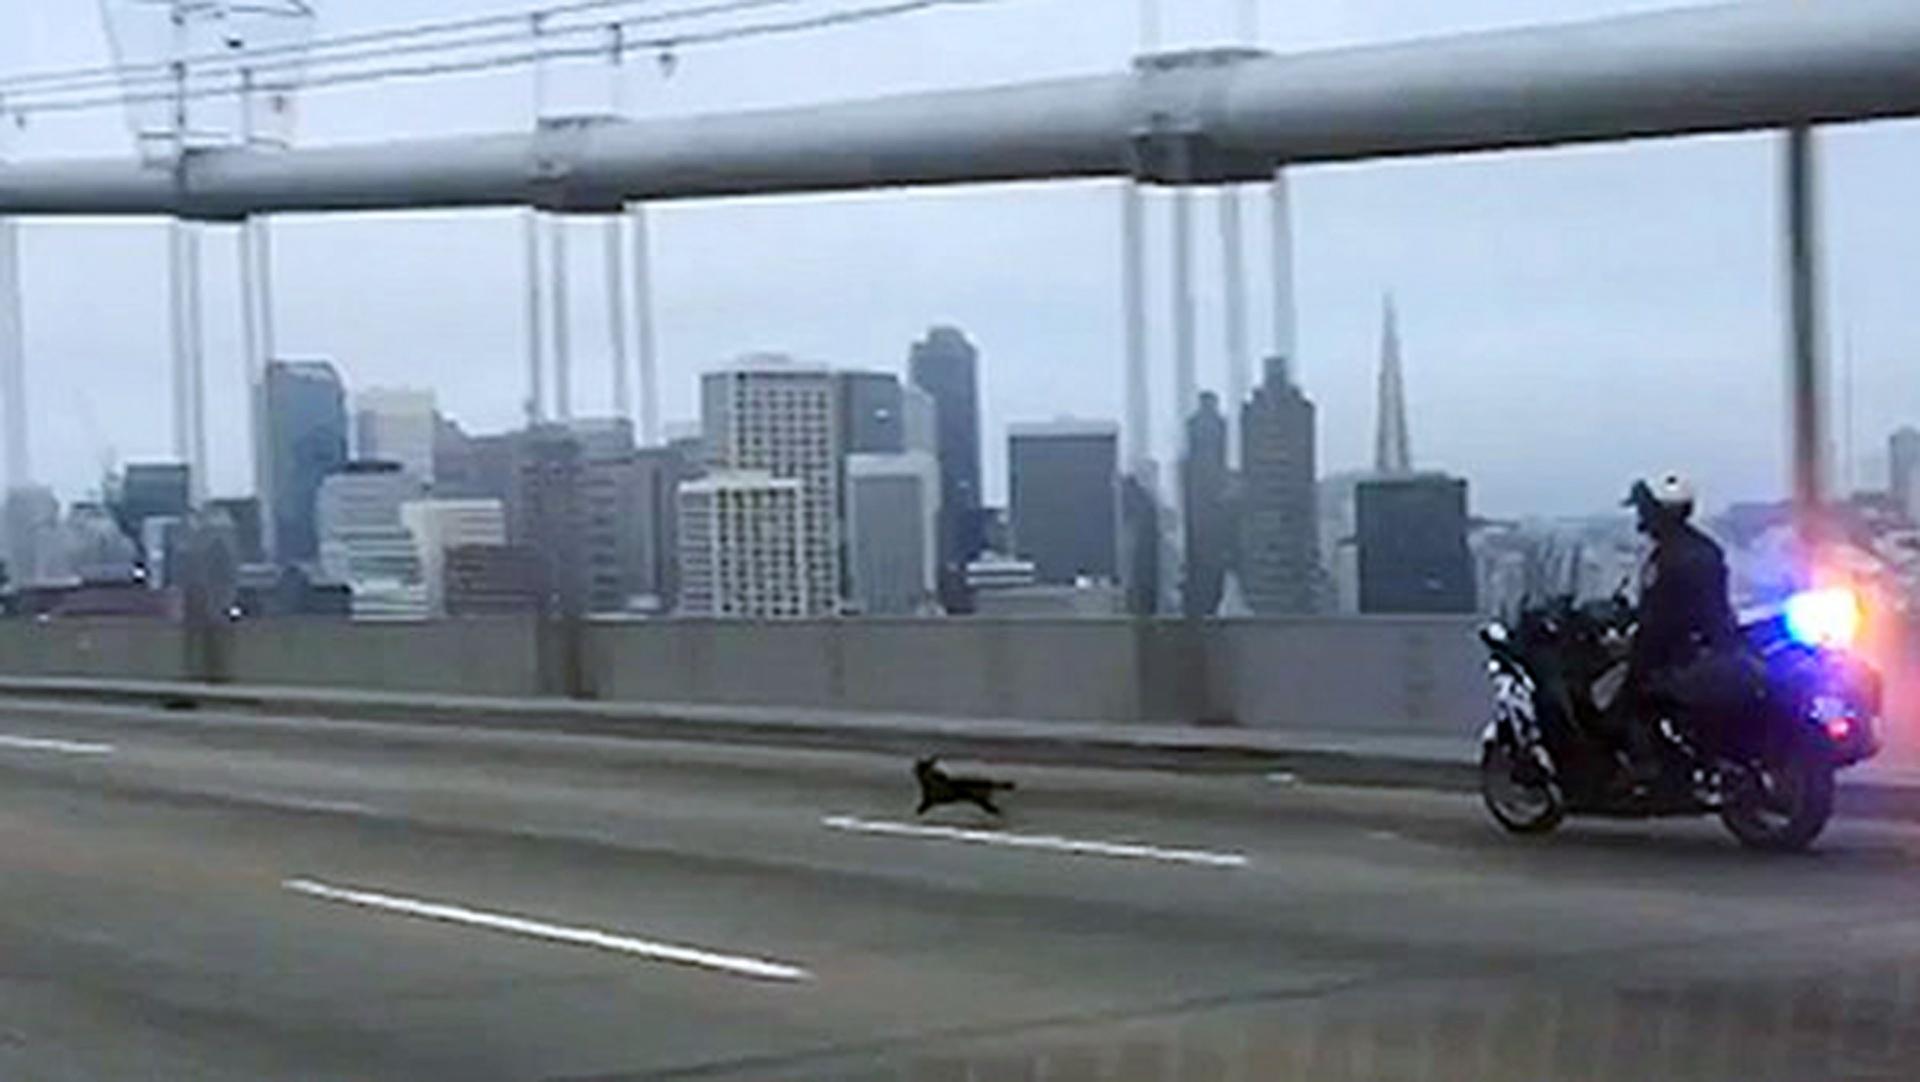 Officer G. Pumphrey pursues a male Chihuahua running loose on the San Francisco-Oakland Bay Bridge